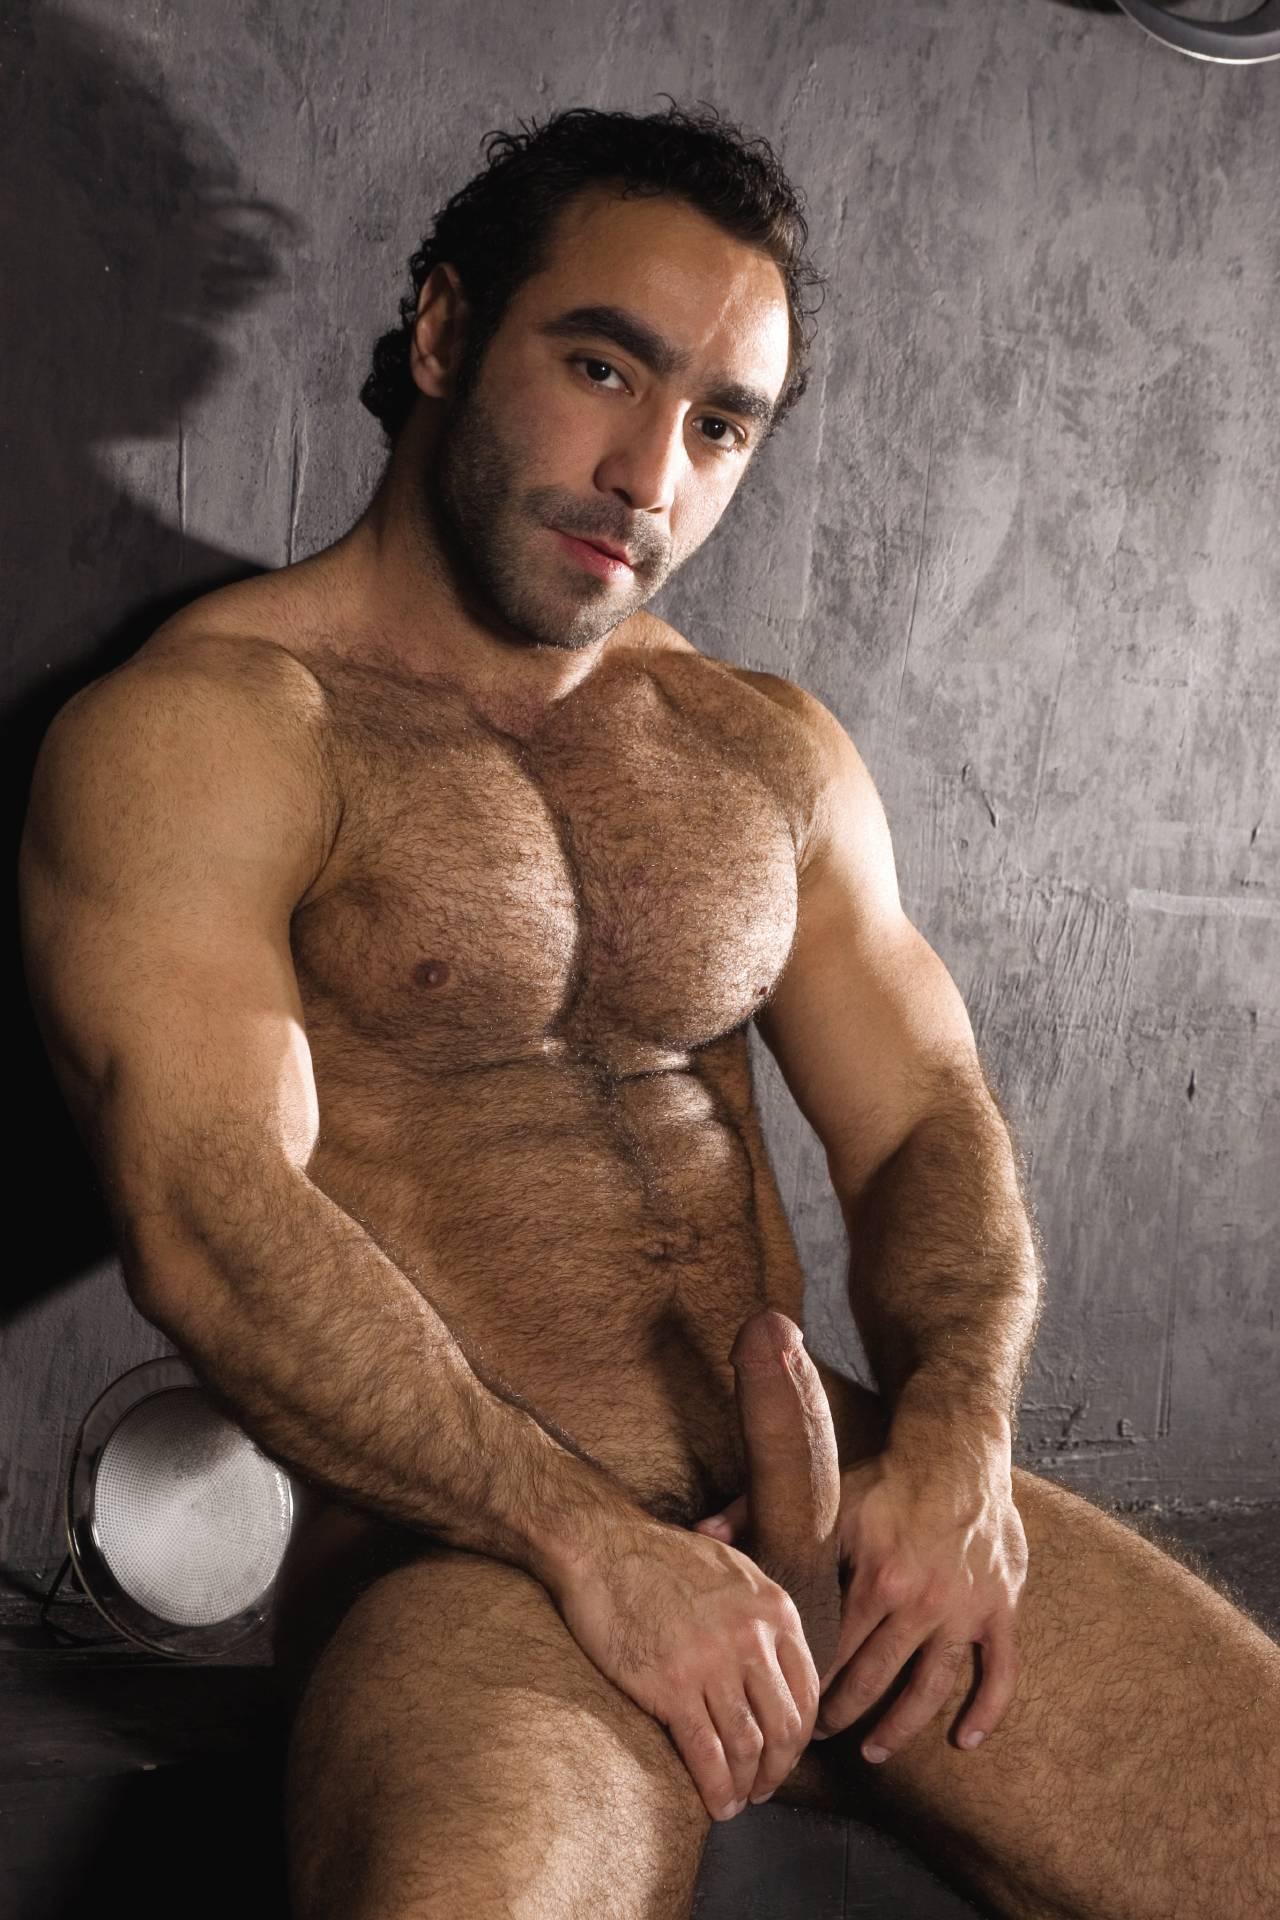 Huessein gay hot daddy dude men porn